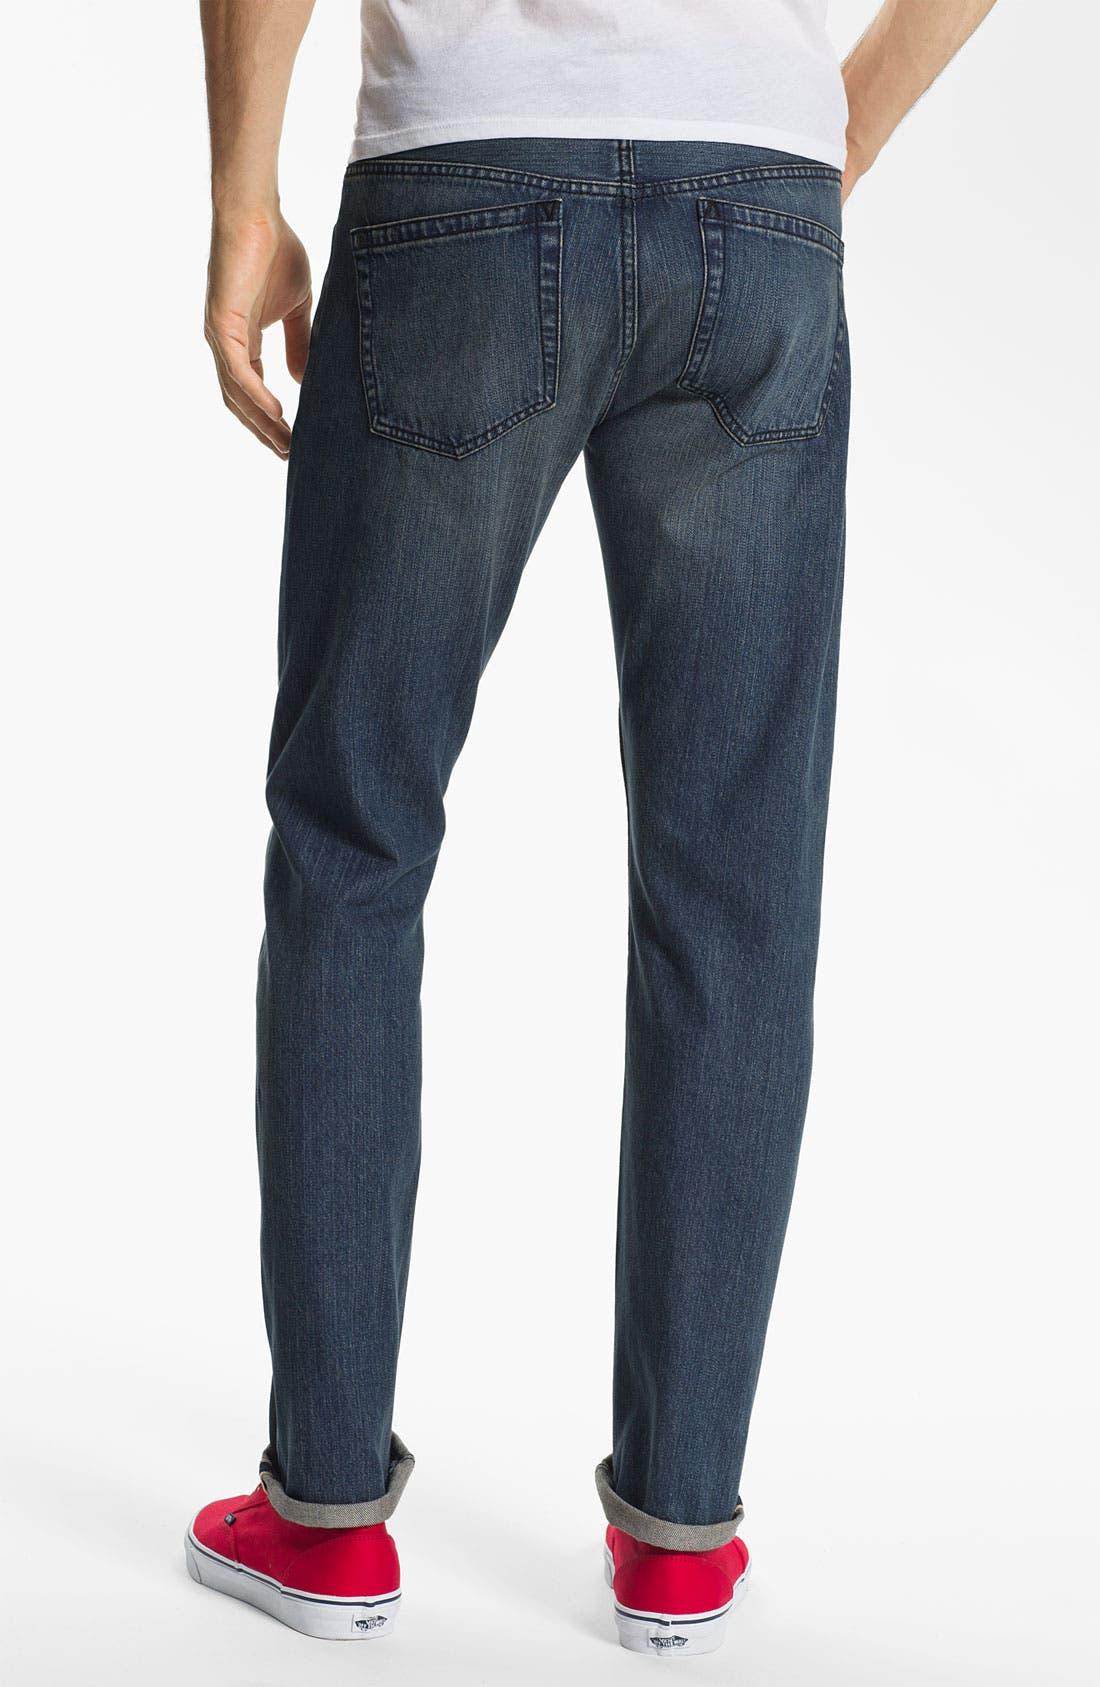 Alternate Image 1 Selected - RVCA Super Slim Straight Leg Selvedge Jeans (Easy Does It)